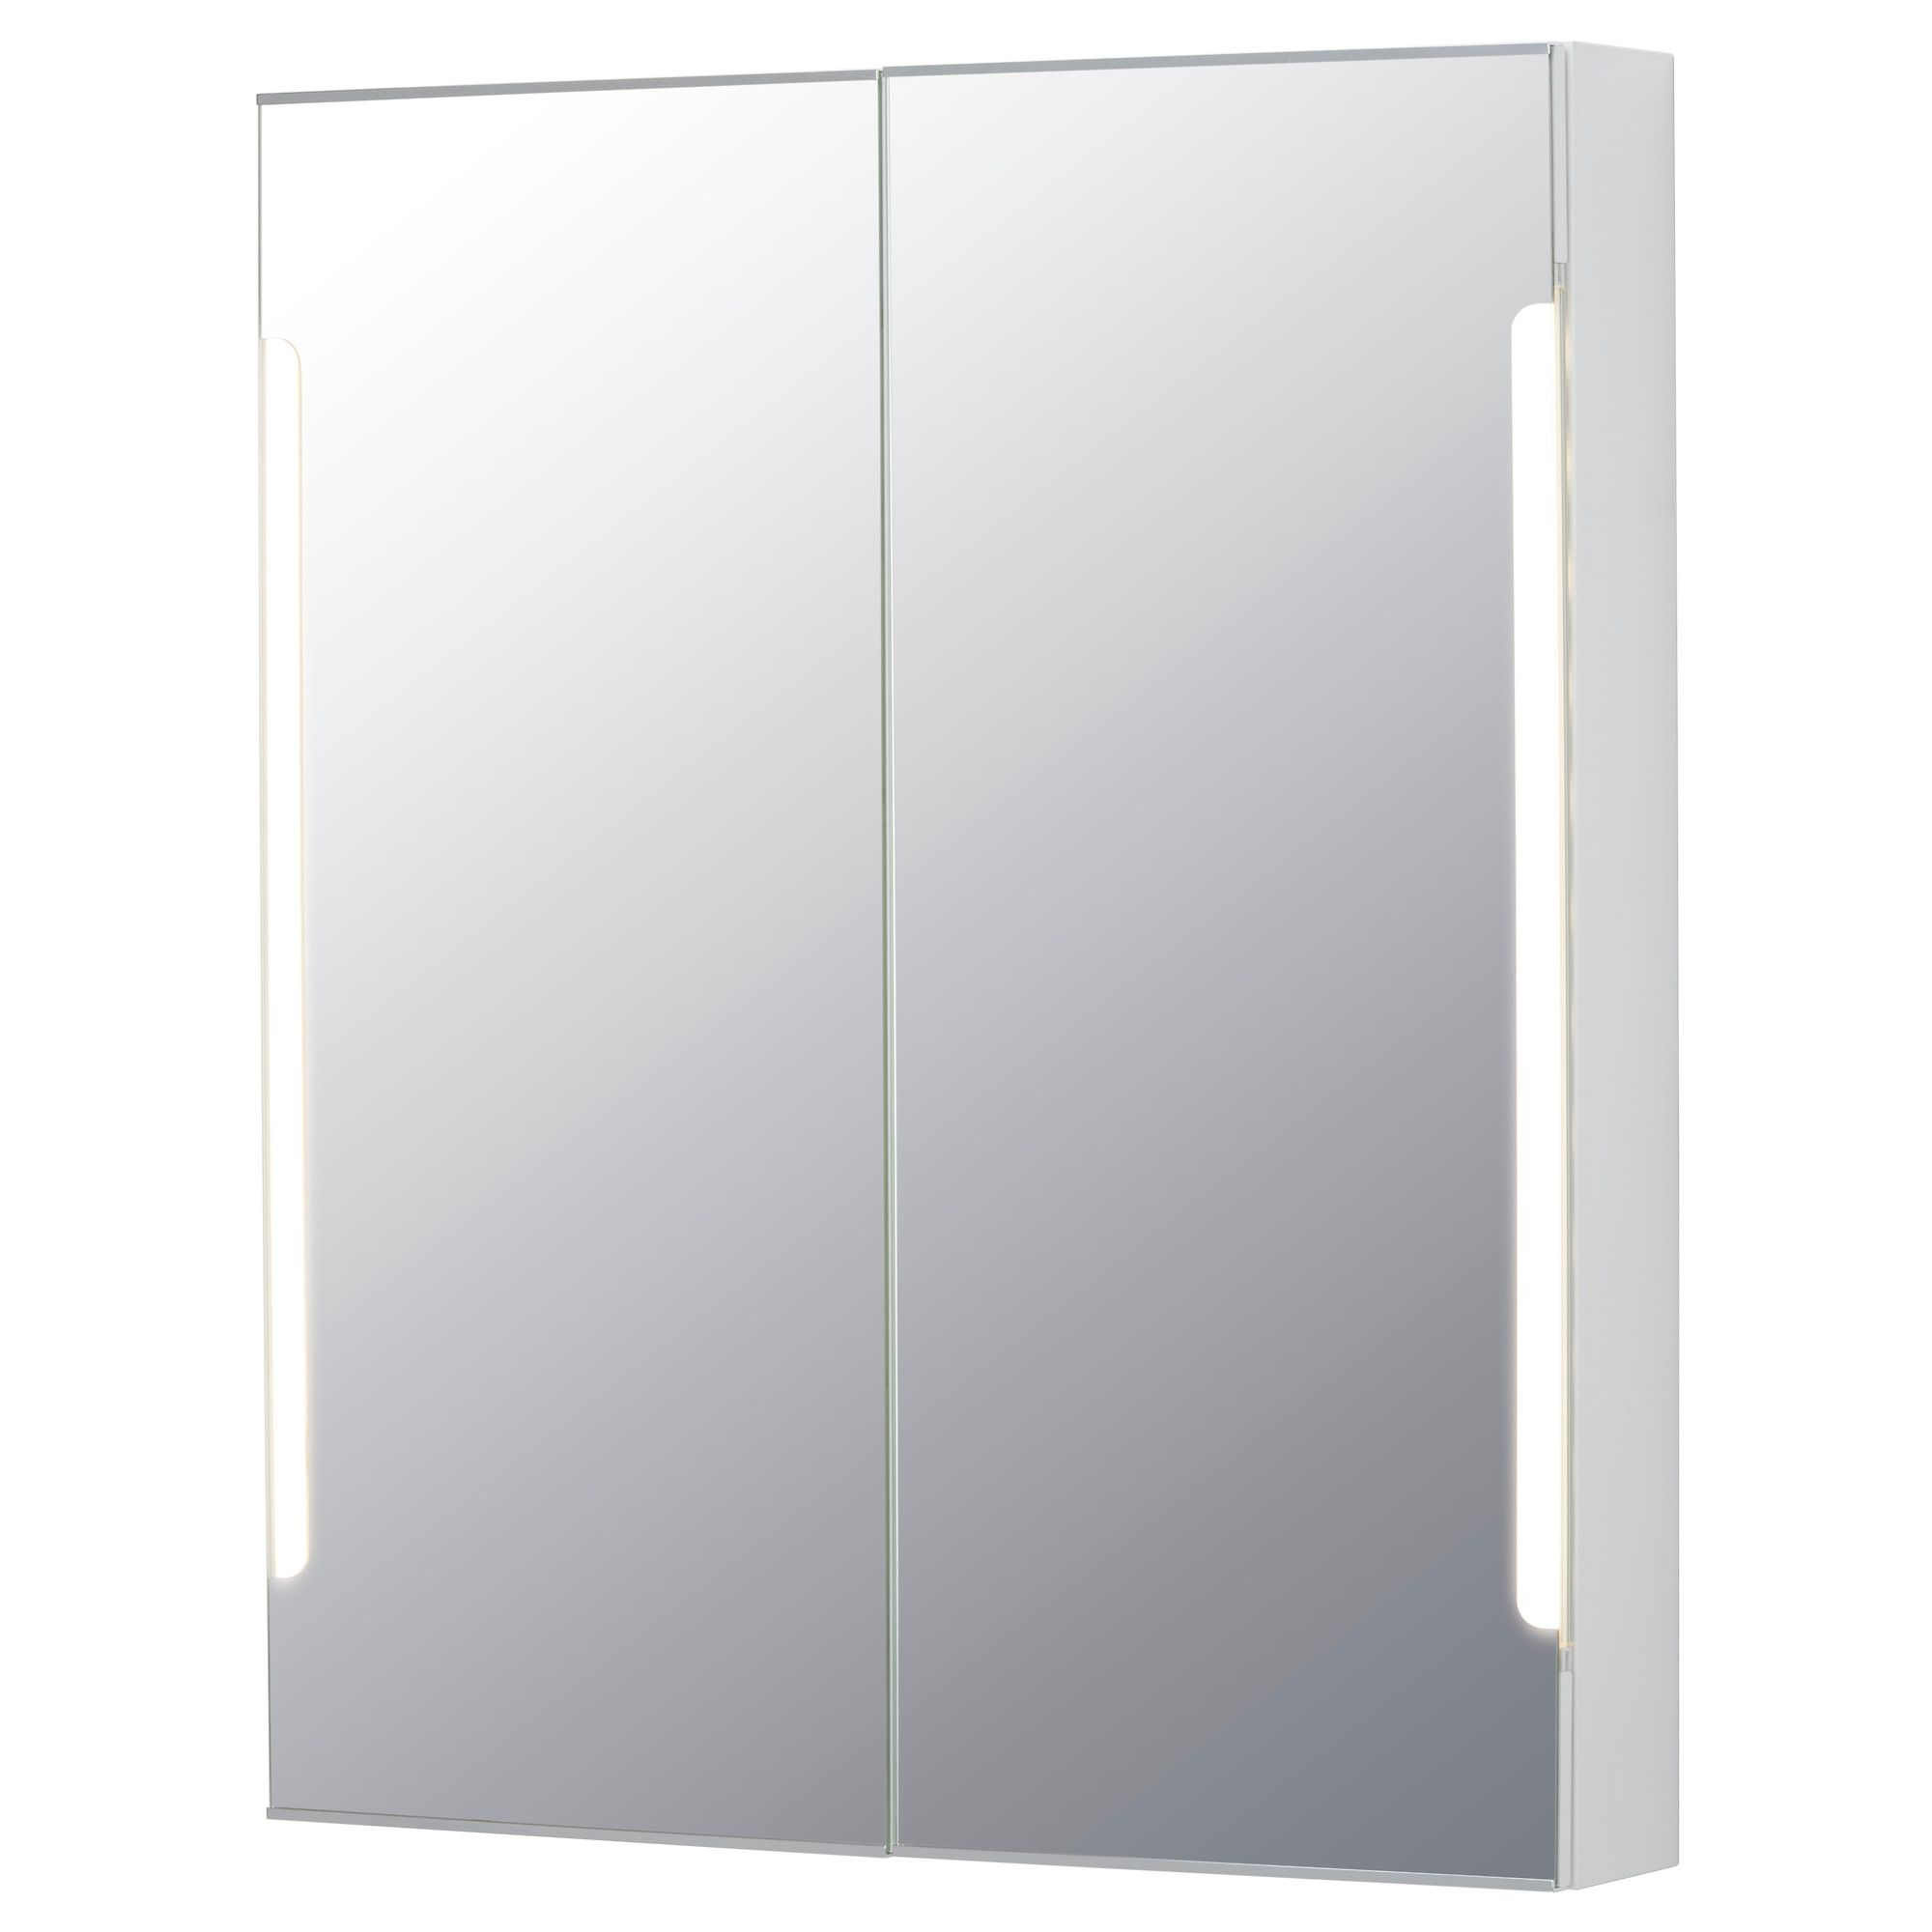 storjorm spiegelschrank m 2 t ren int bel wei. Black Bedroom Furniture Sets. Home Design Ideas